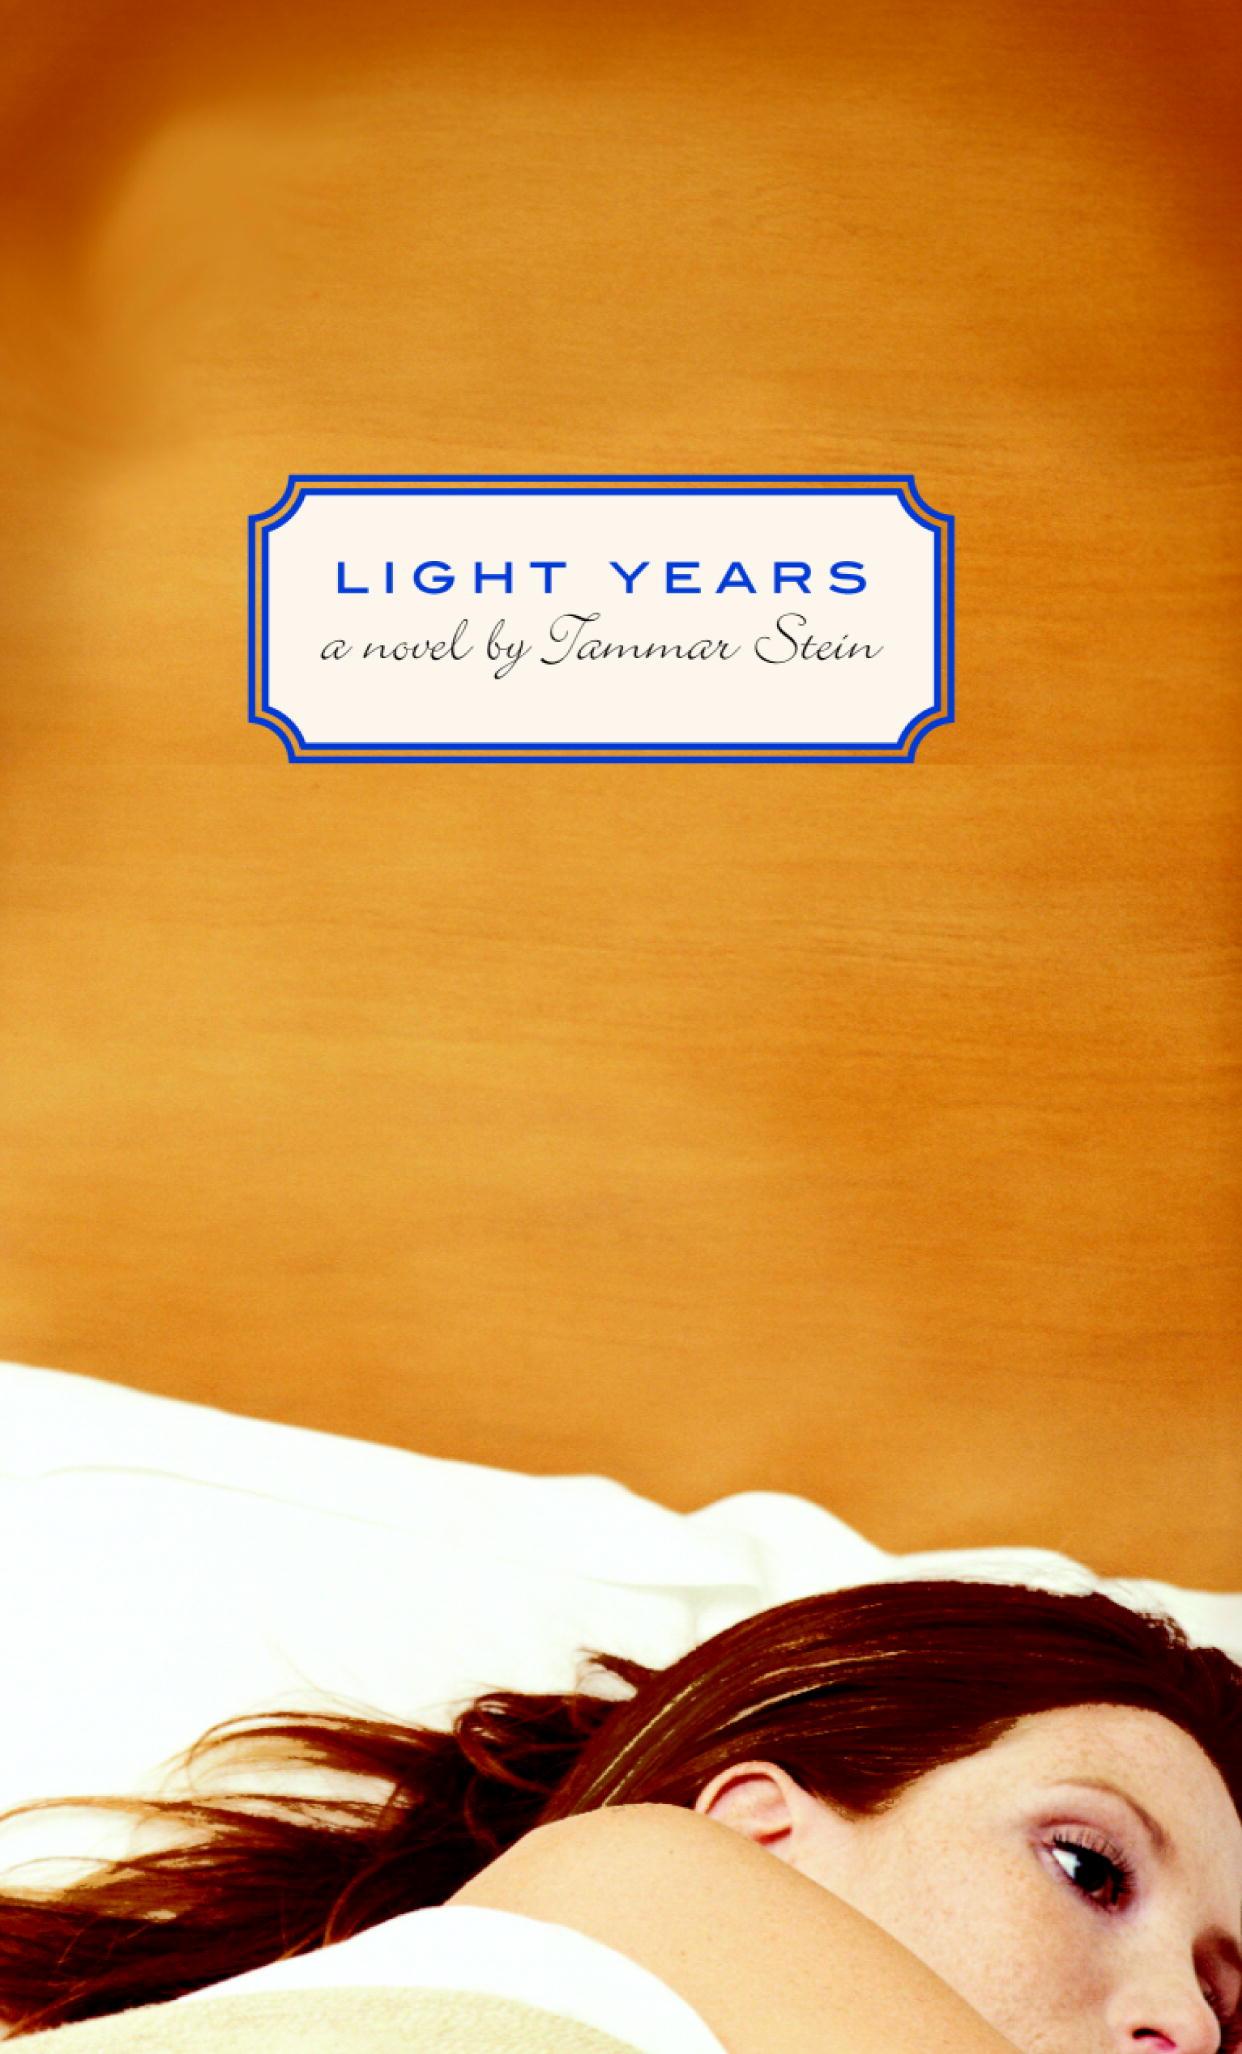 Light Years cover hd.jpg